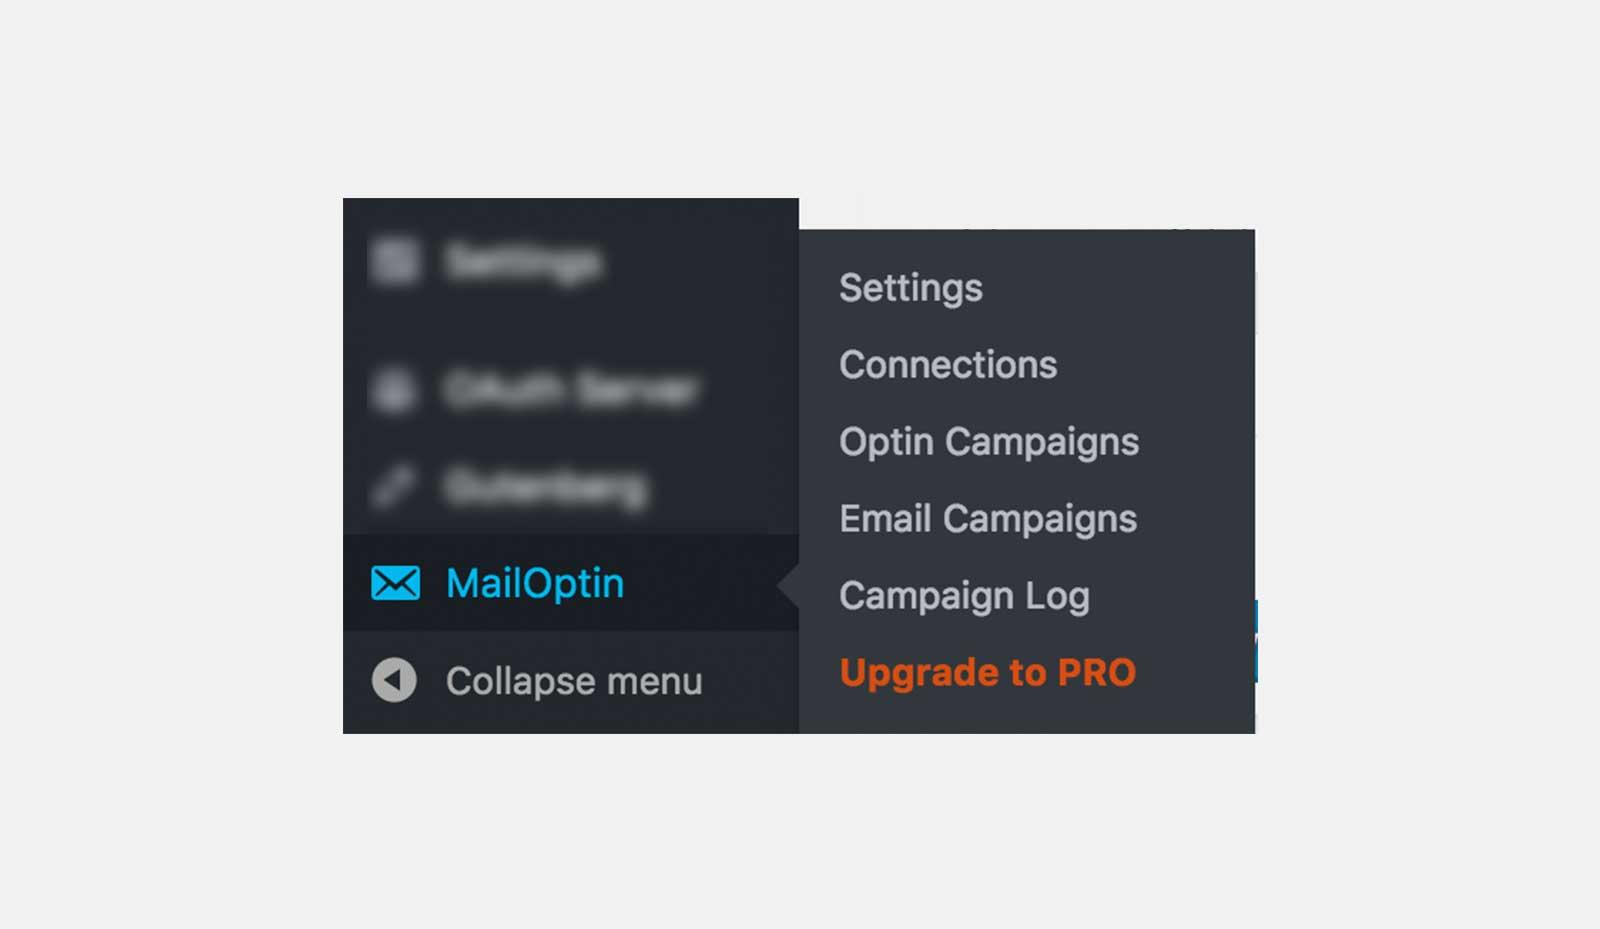 MailOptin menu